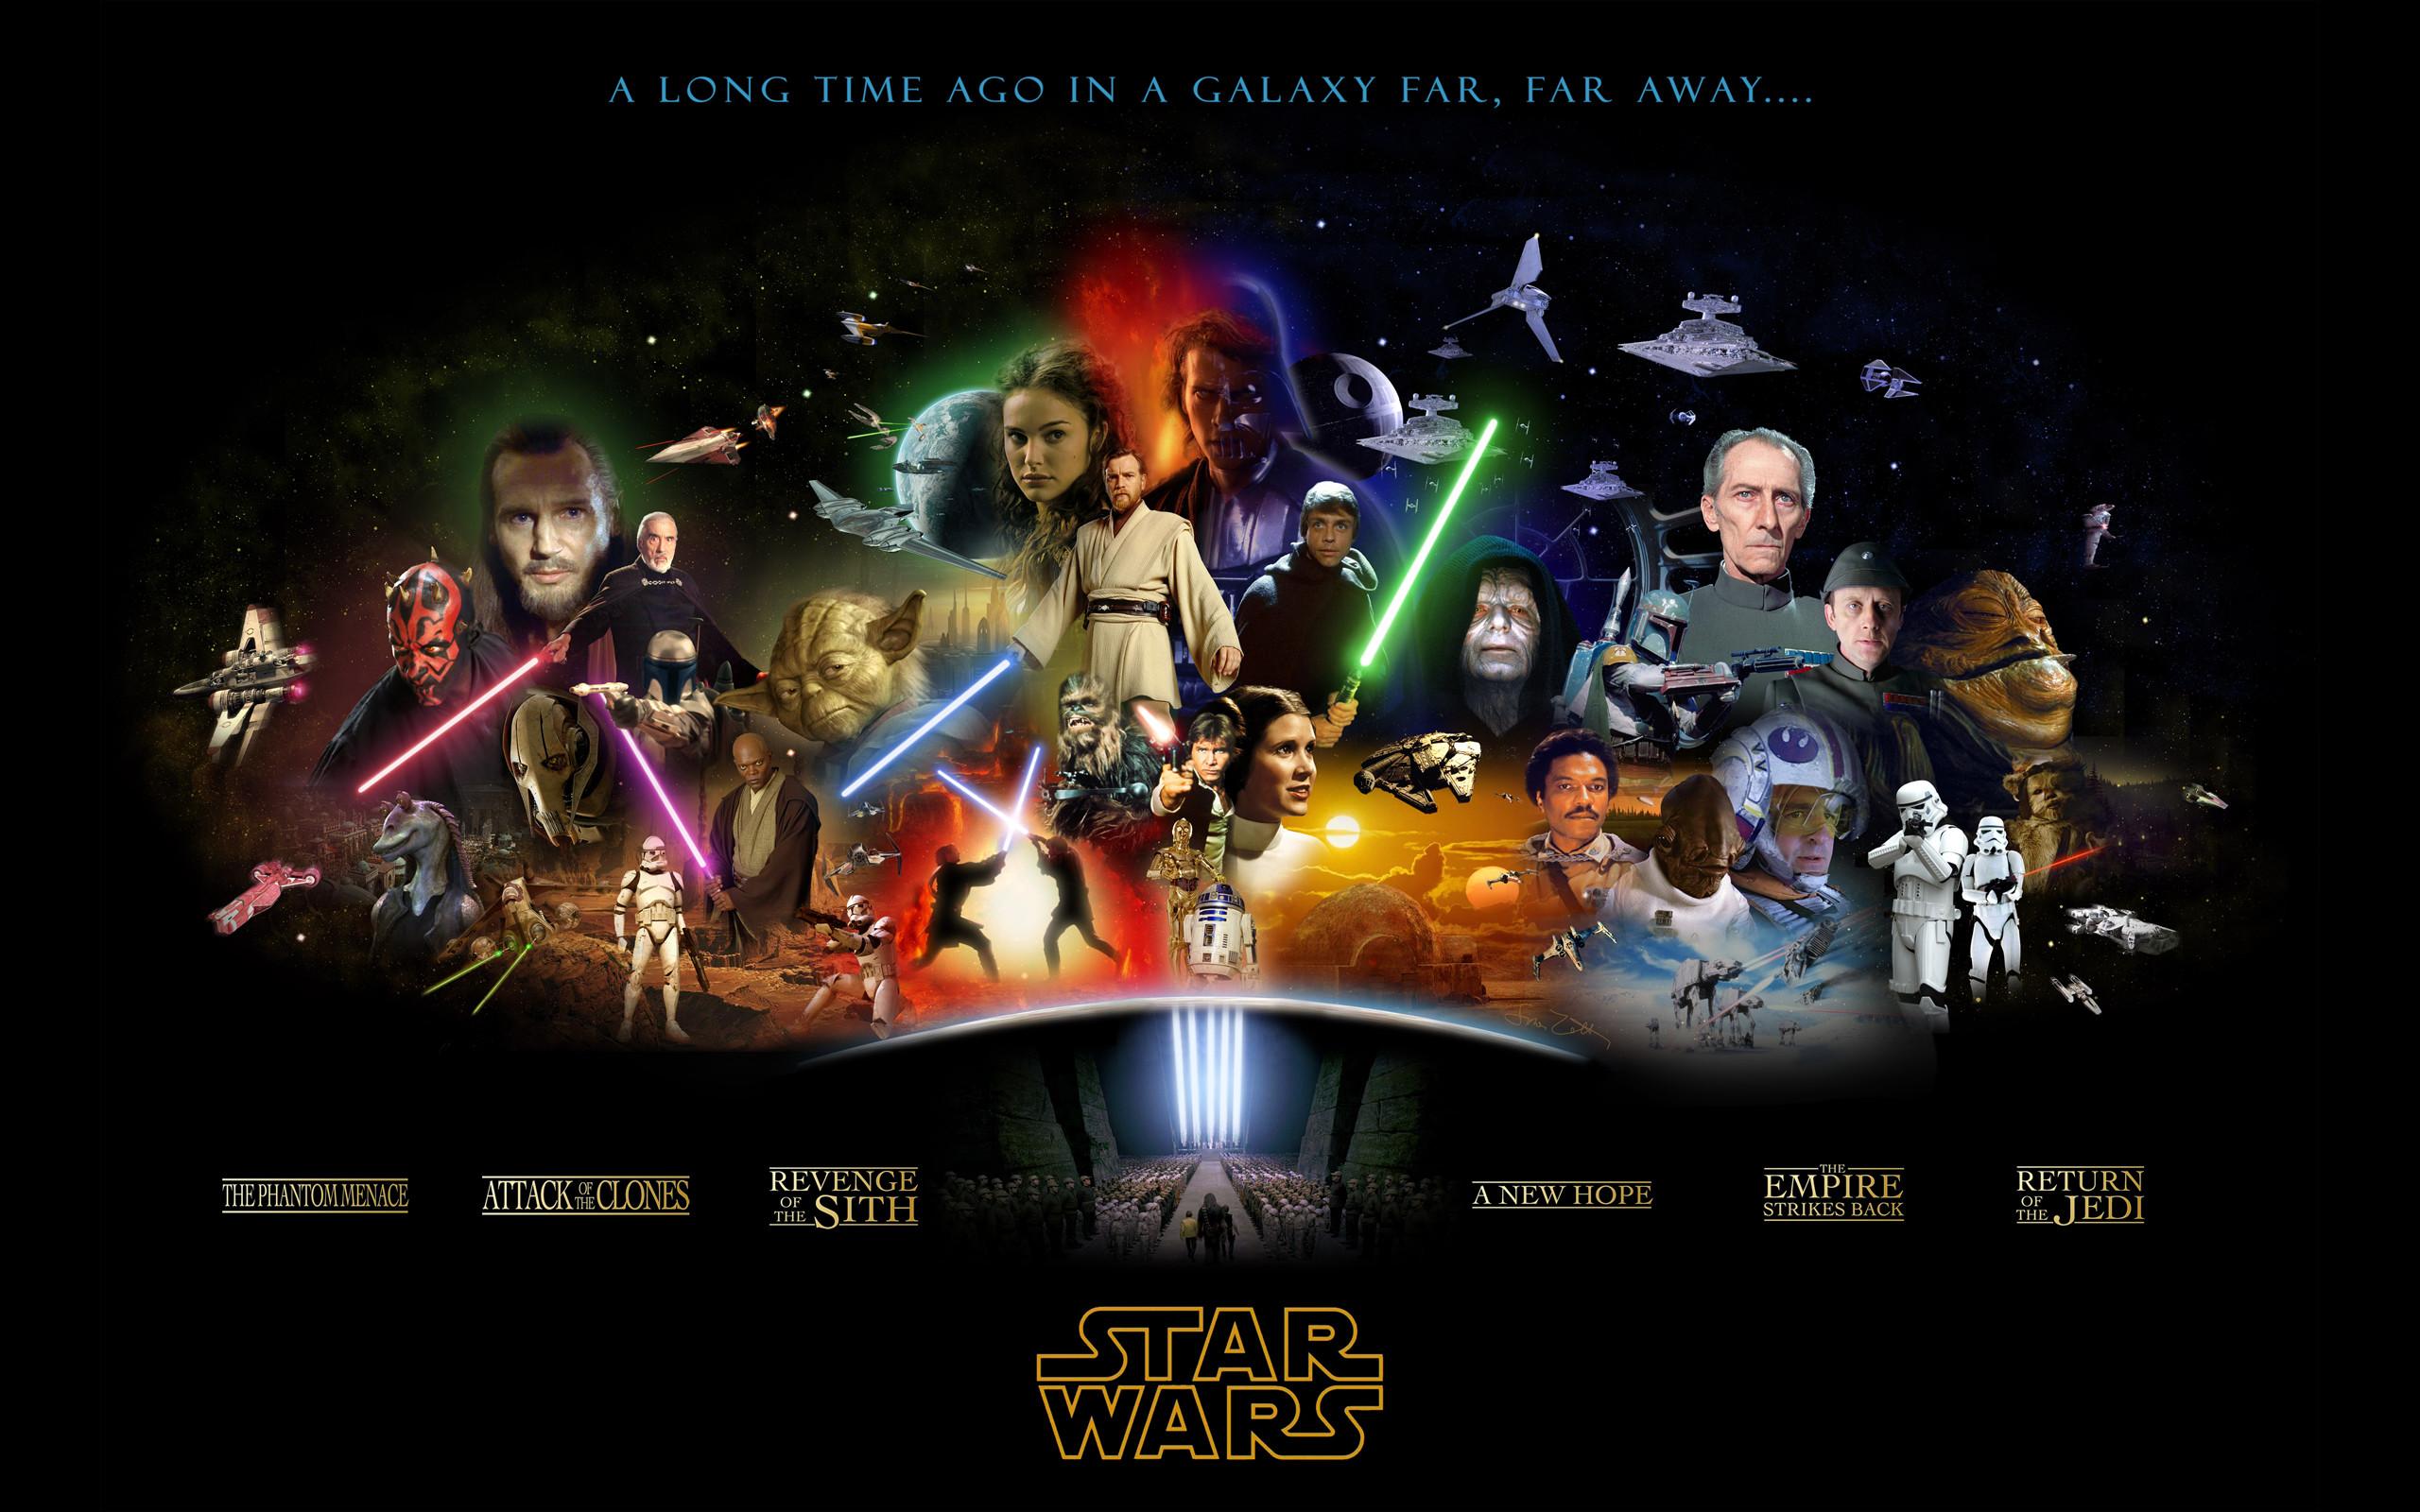 Anakin Skywalker Boba Fett Darth Maul Vader Jango Jar Binks Leia Organa  Luke Mace Windu Obi-Wan Kenobi Revenge Of The Sith Star Wars Empire Strikes  Back …